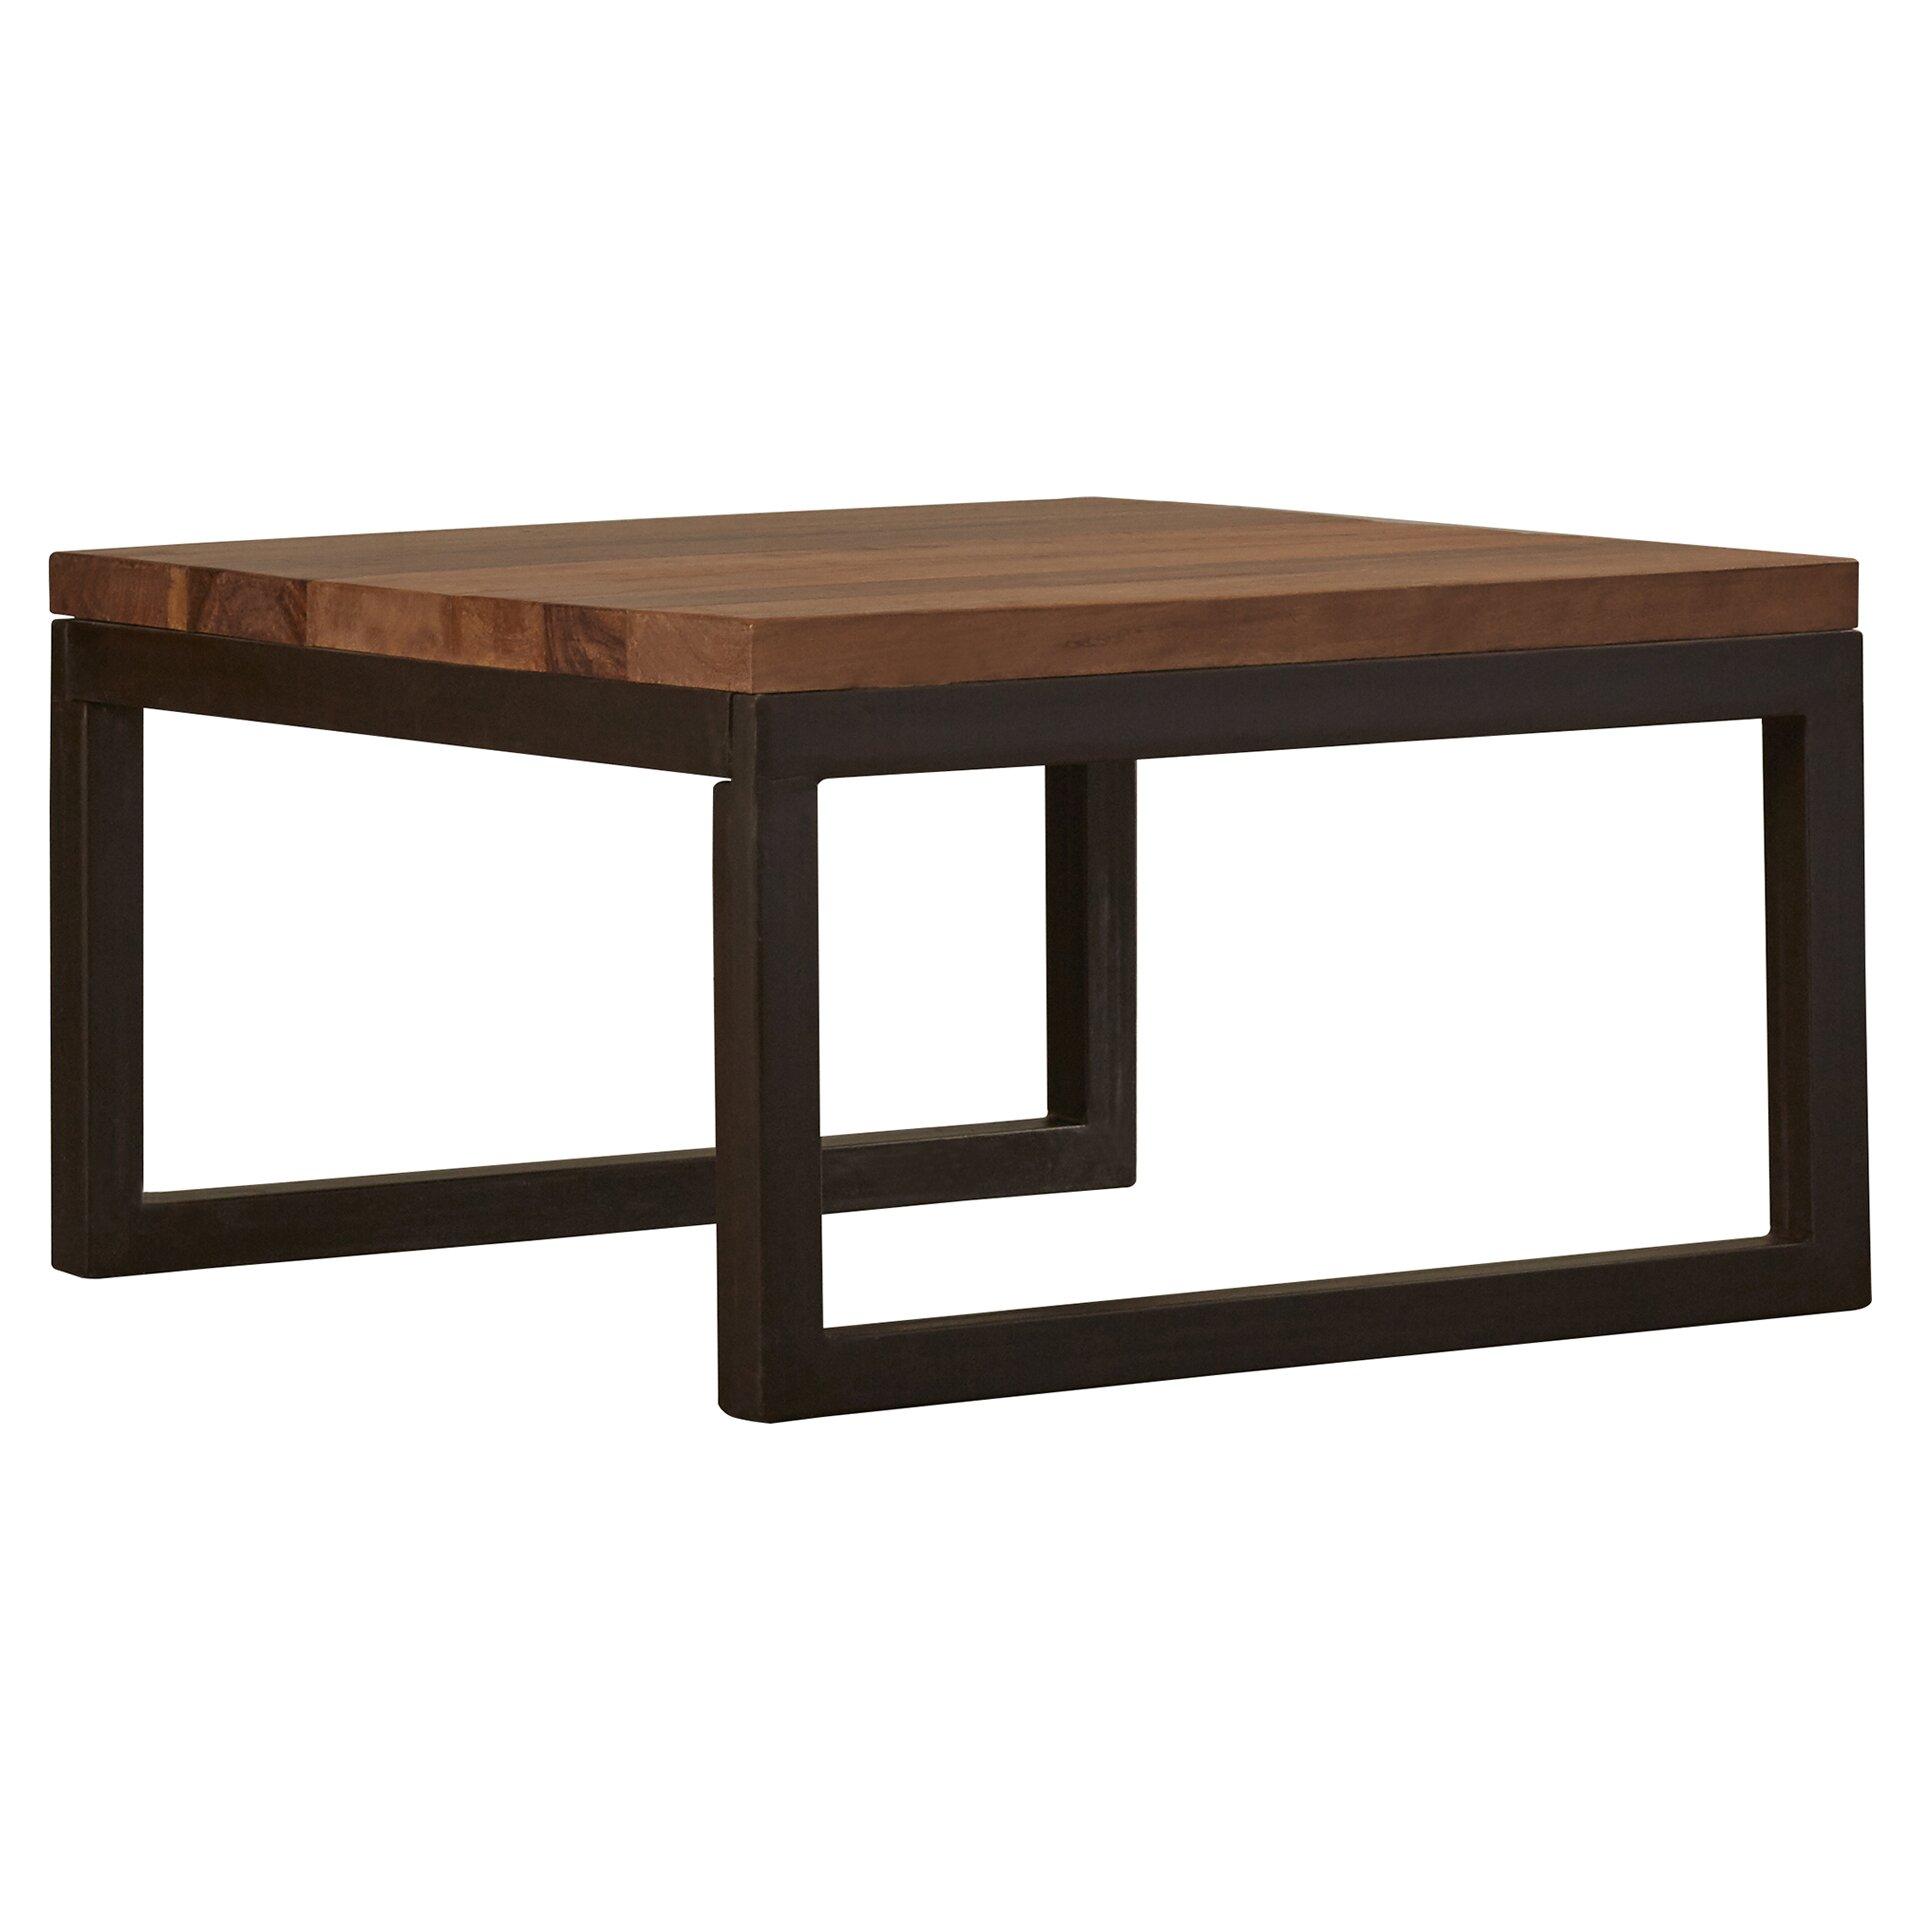 Trent Austin Design Laguna Coffee Table Reviews: Trent Austin Design Monrovia Coffee Table & Reviews